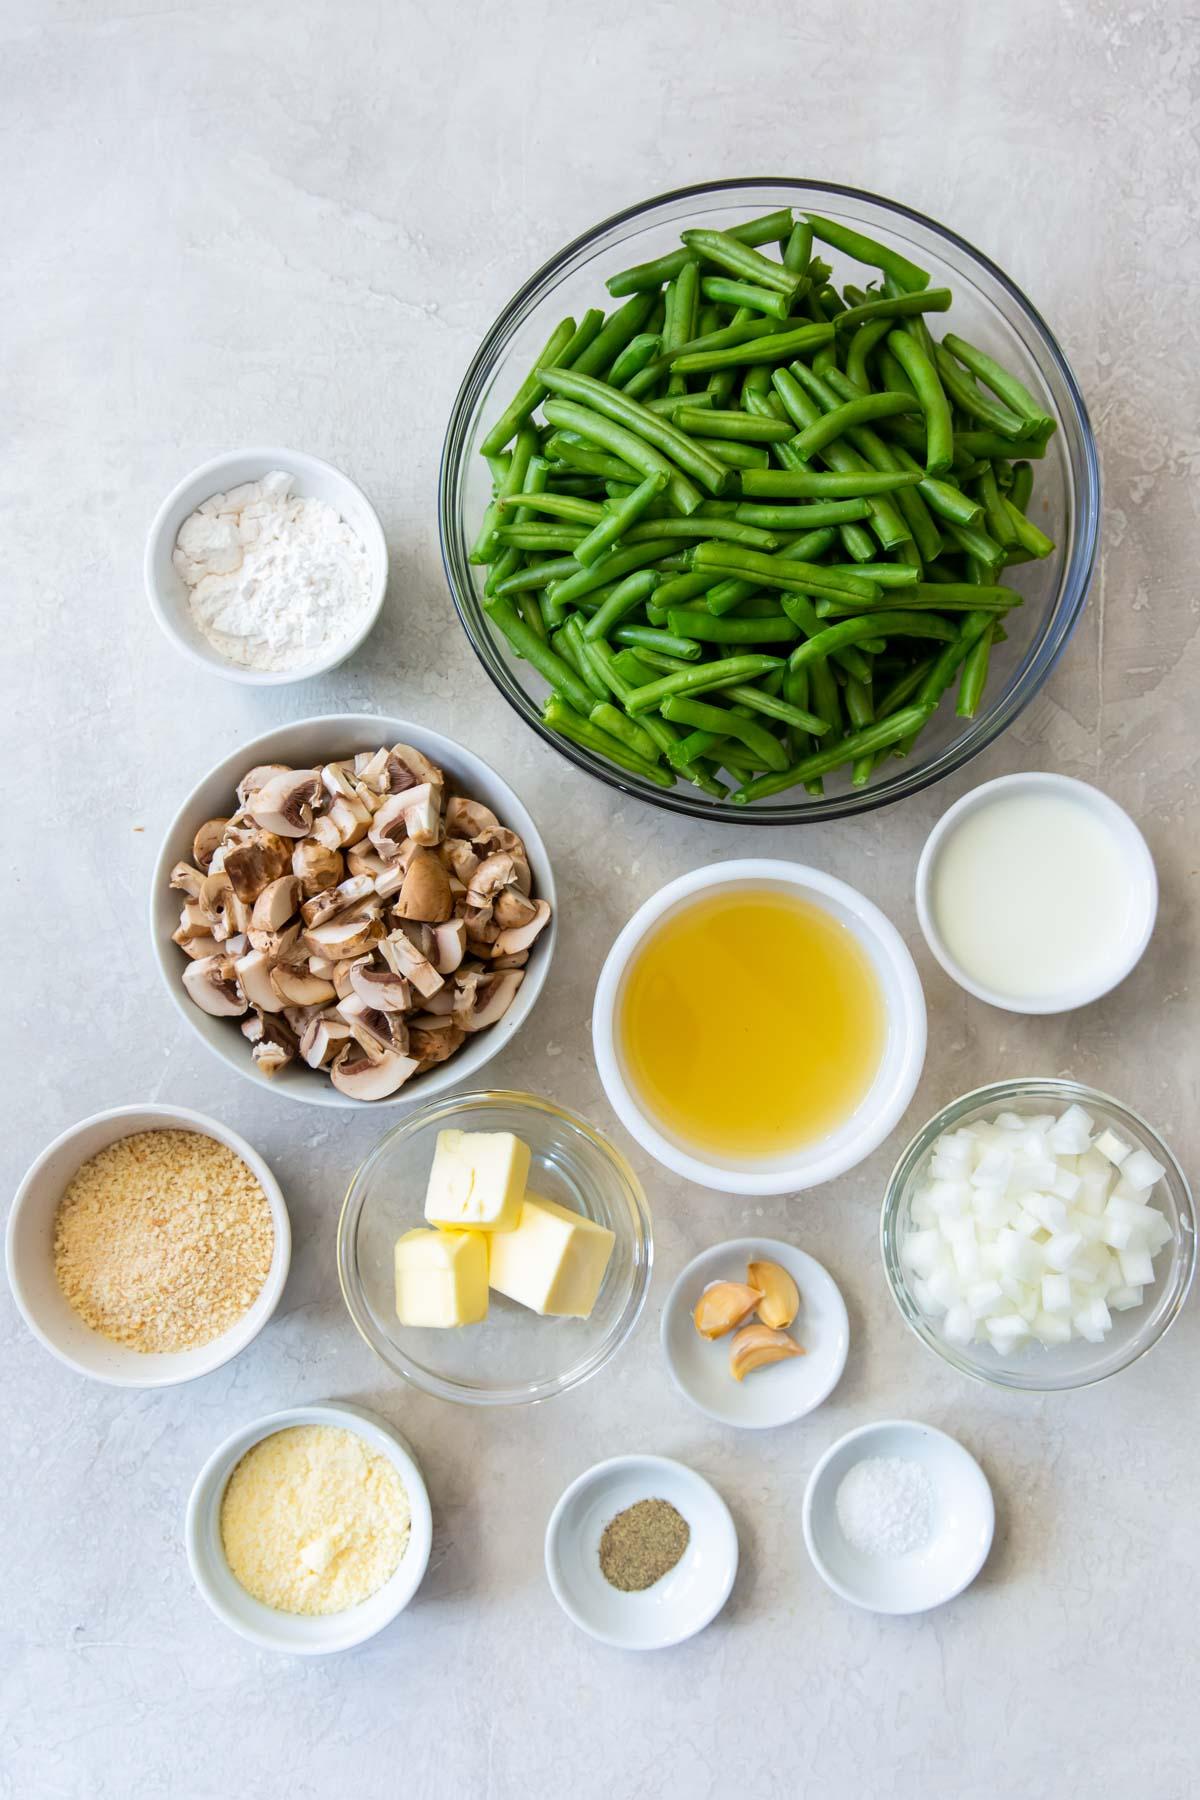 ingredients for green bean casserole recipe